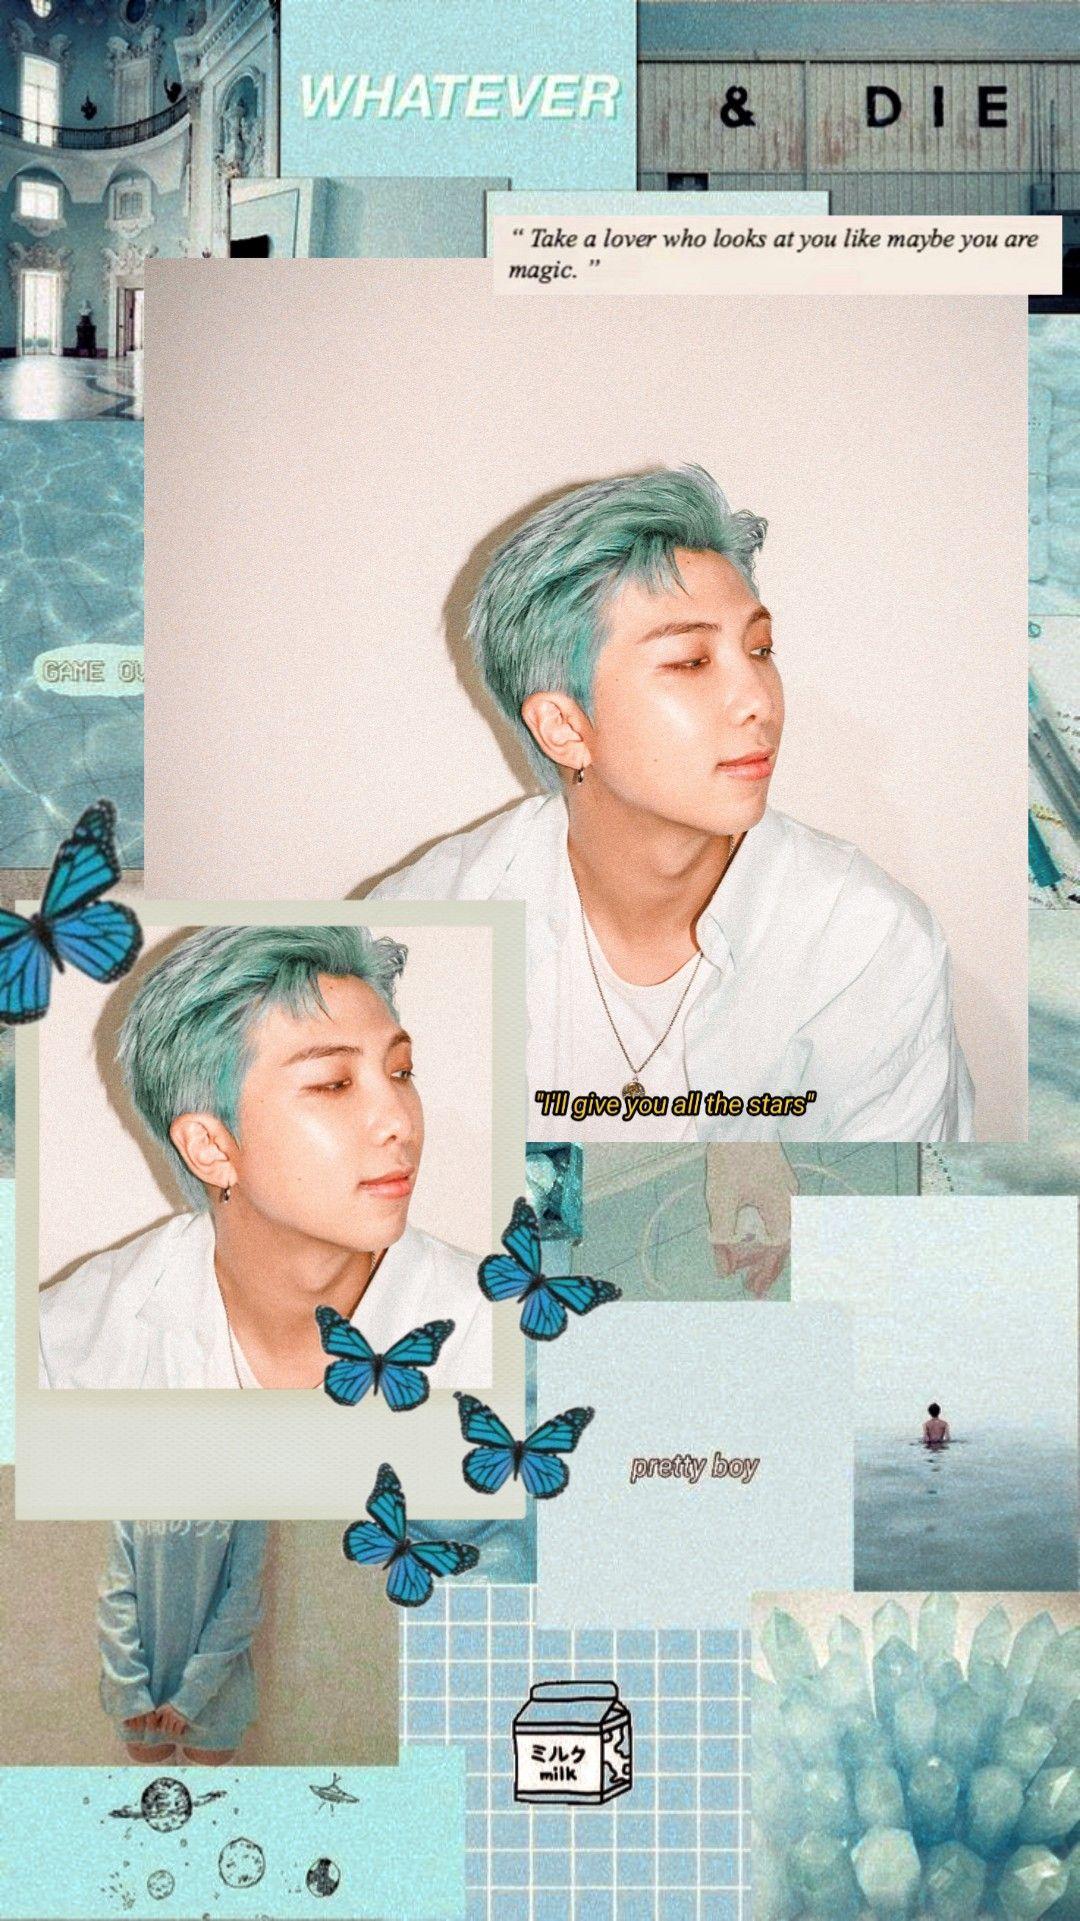 Bts S Rm Dynamite Hd Lockscreen In 2021 Bts Wallpaper Kim Taehyung Wallpaper Bts Aesthetic Pictures Wallpaper aesthetic rm bts